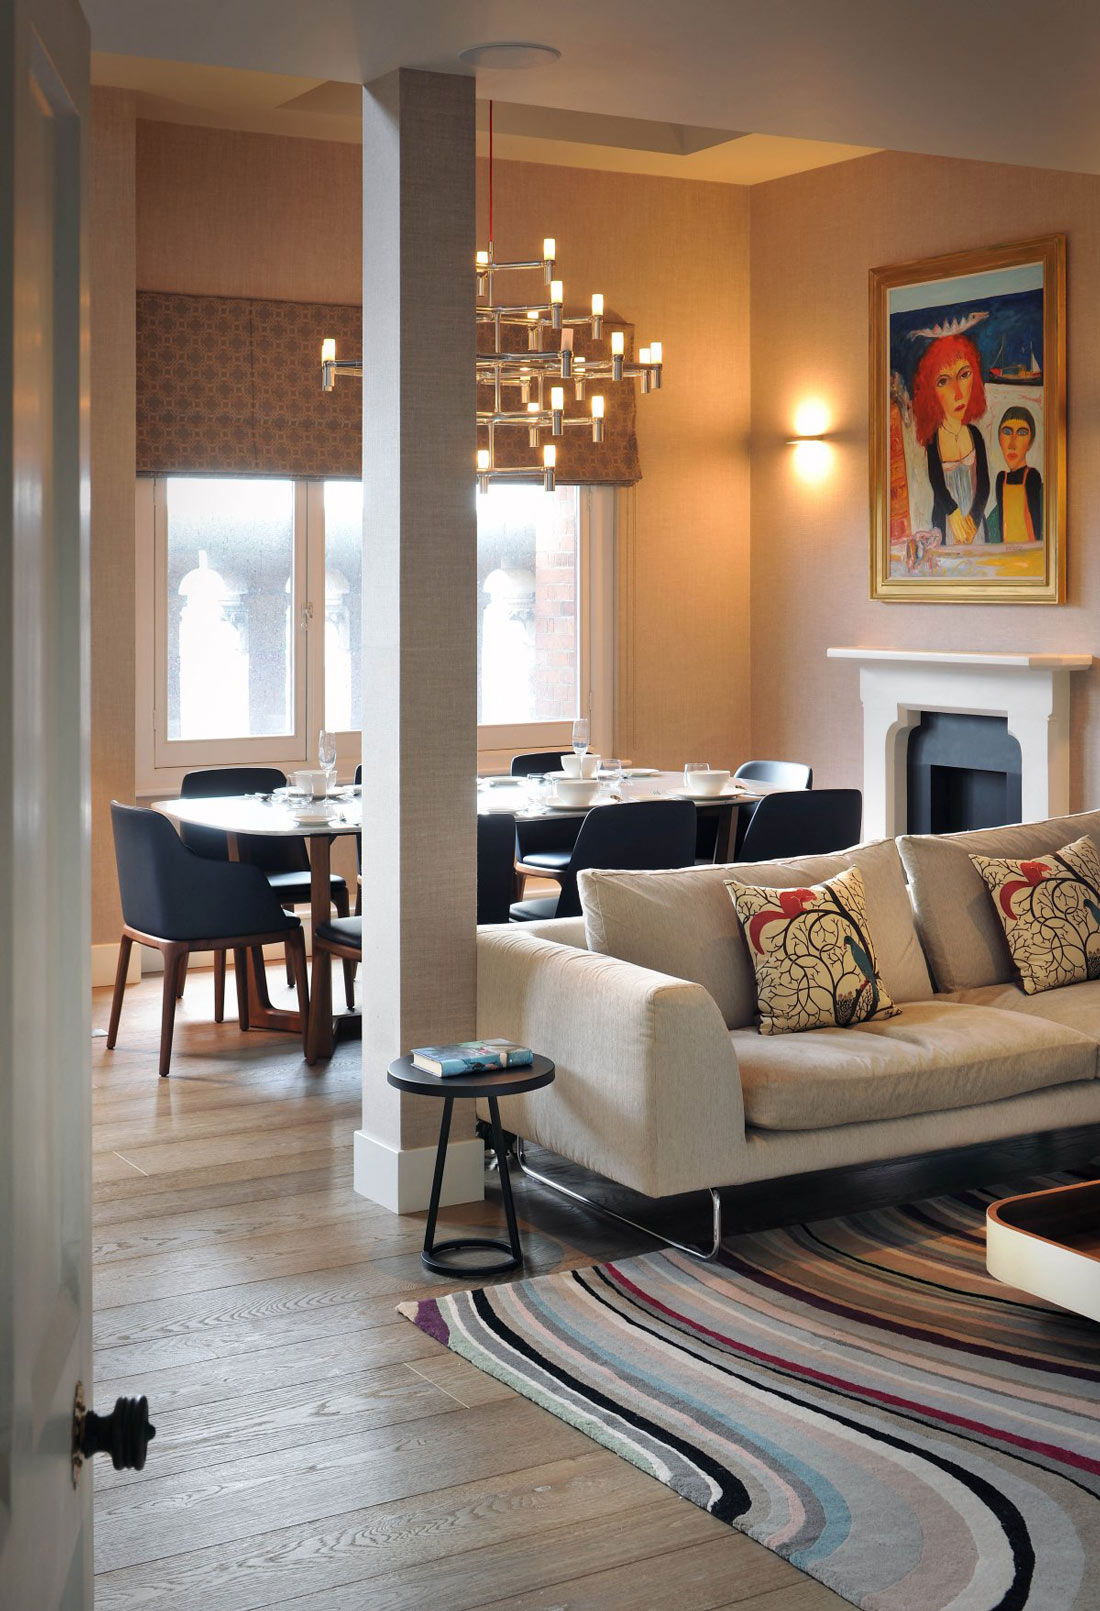 Sofa, Dining Table, Rug, Art, Lighting, St Pancras Penthouse Apartment in London